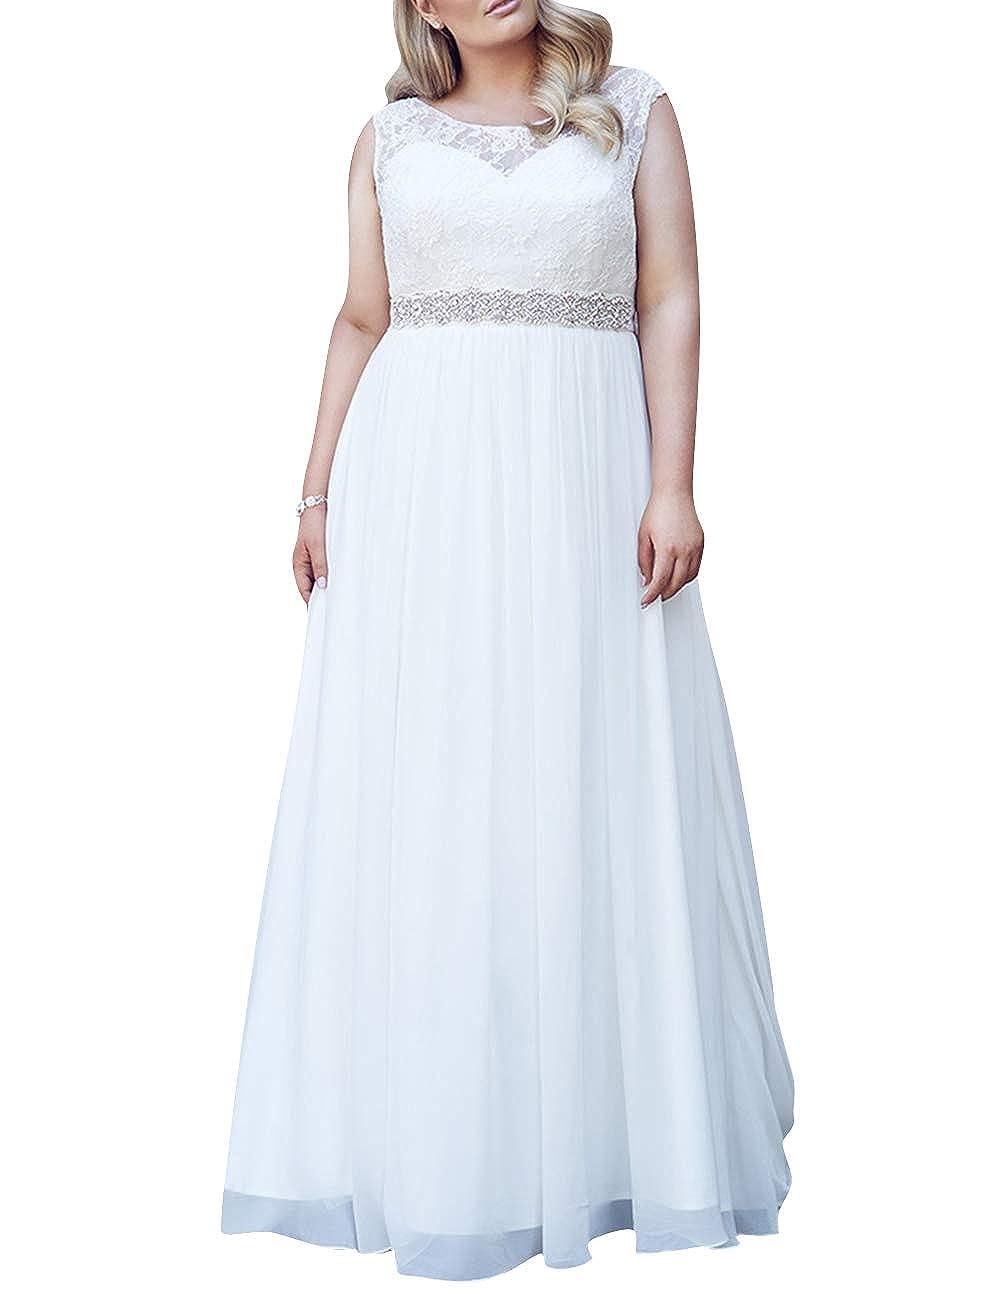 Wedding Dress Plus Size Lace Bride Dresses Crystal Sash ...